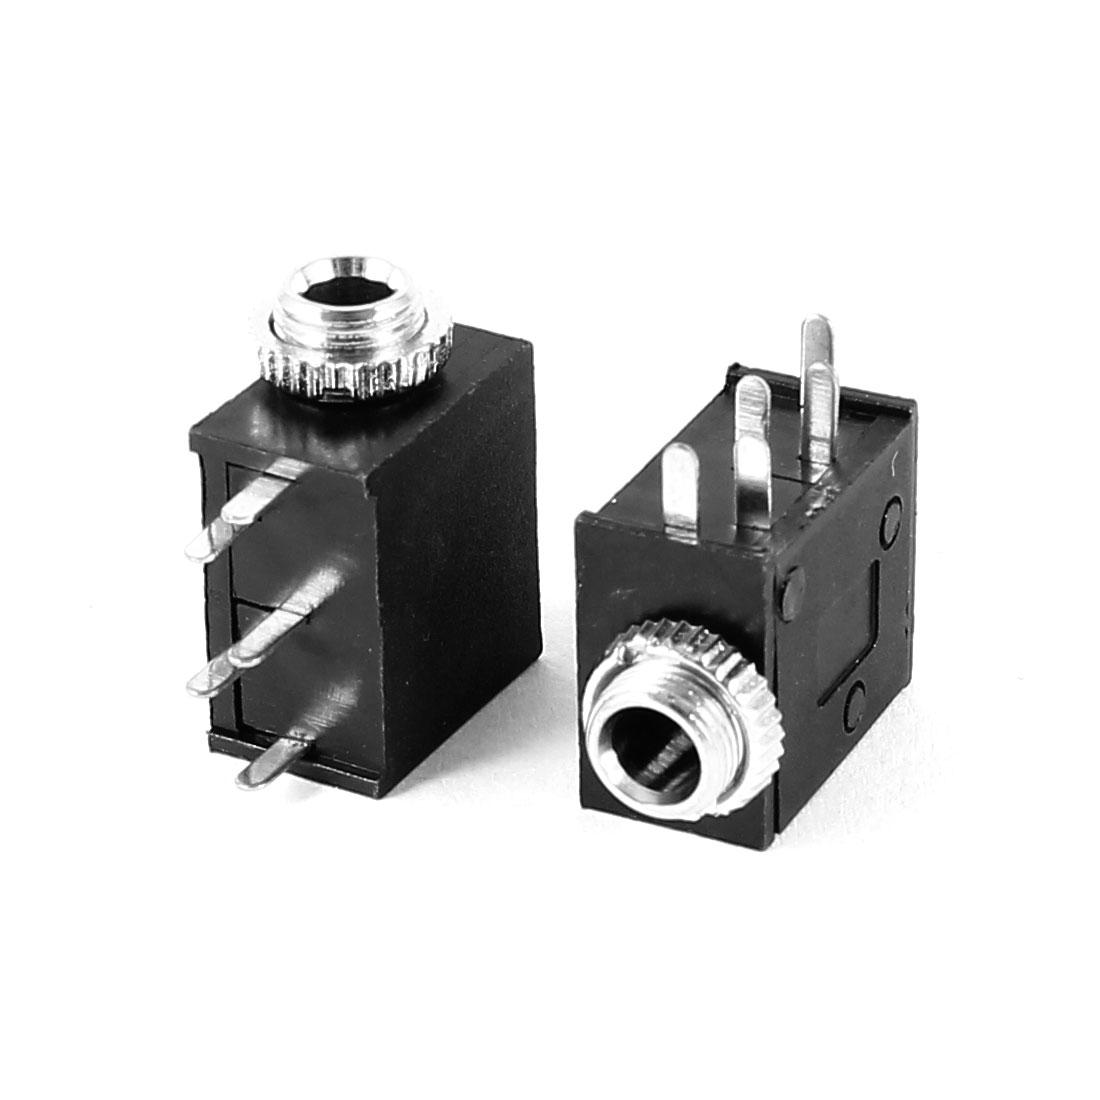 2 Pcs Black PCB Mount 5 Pin Terminals Female 3.5mm Audio Jack Socket